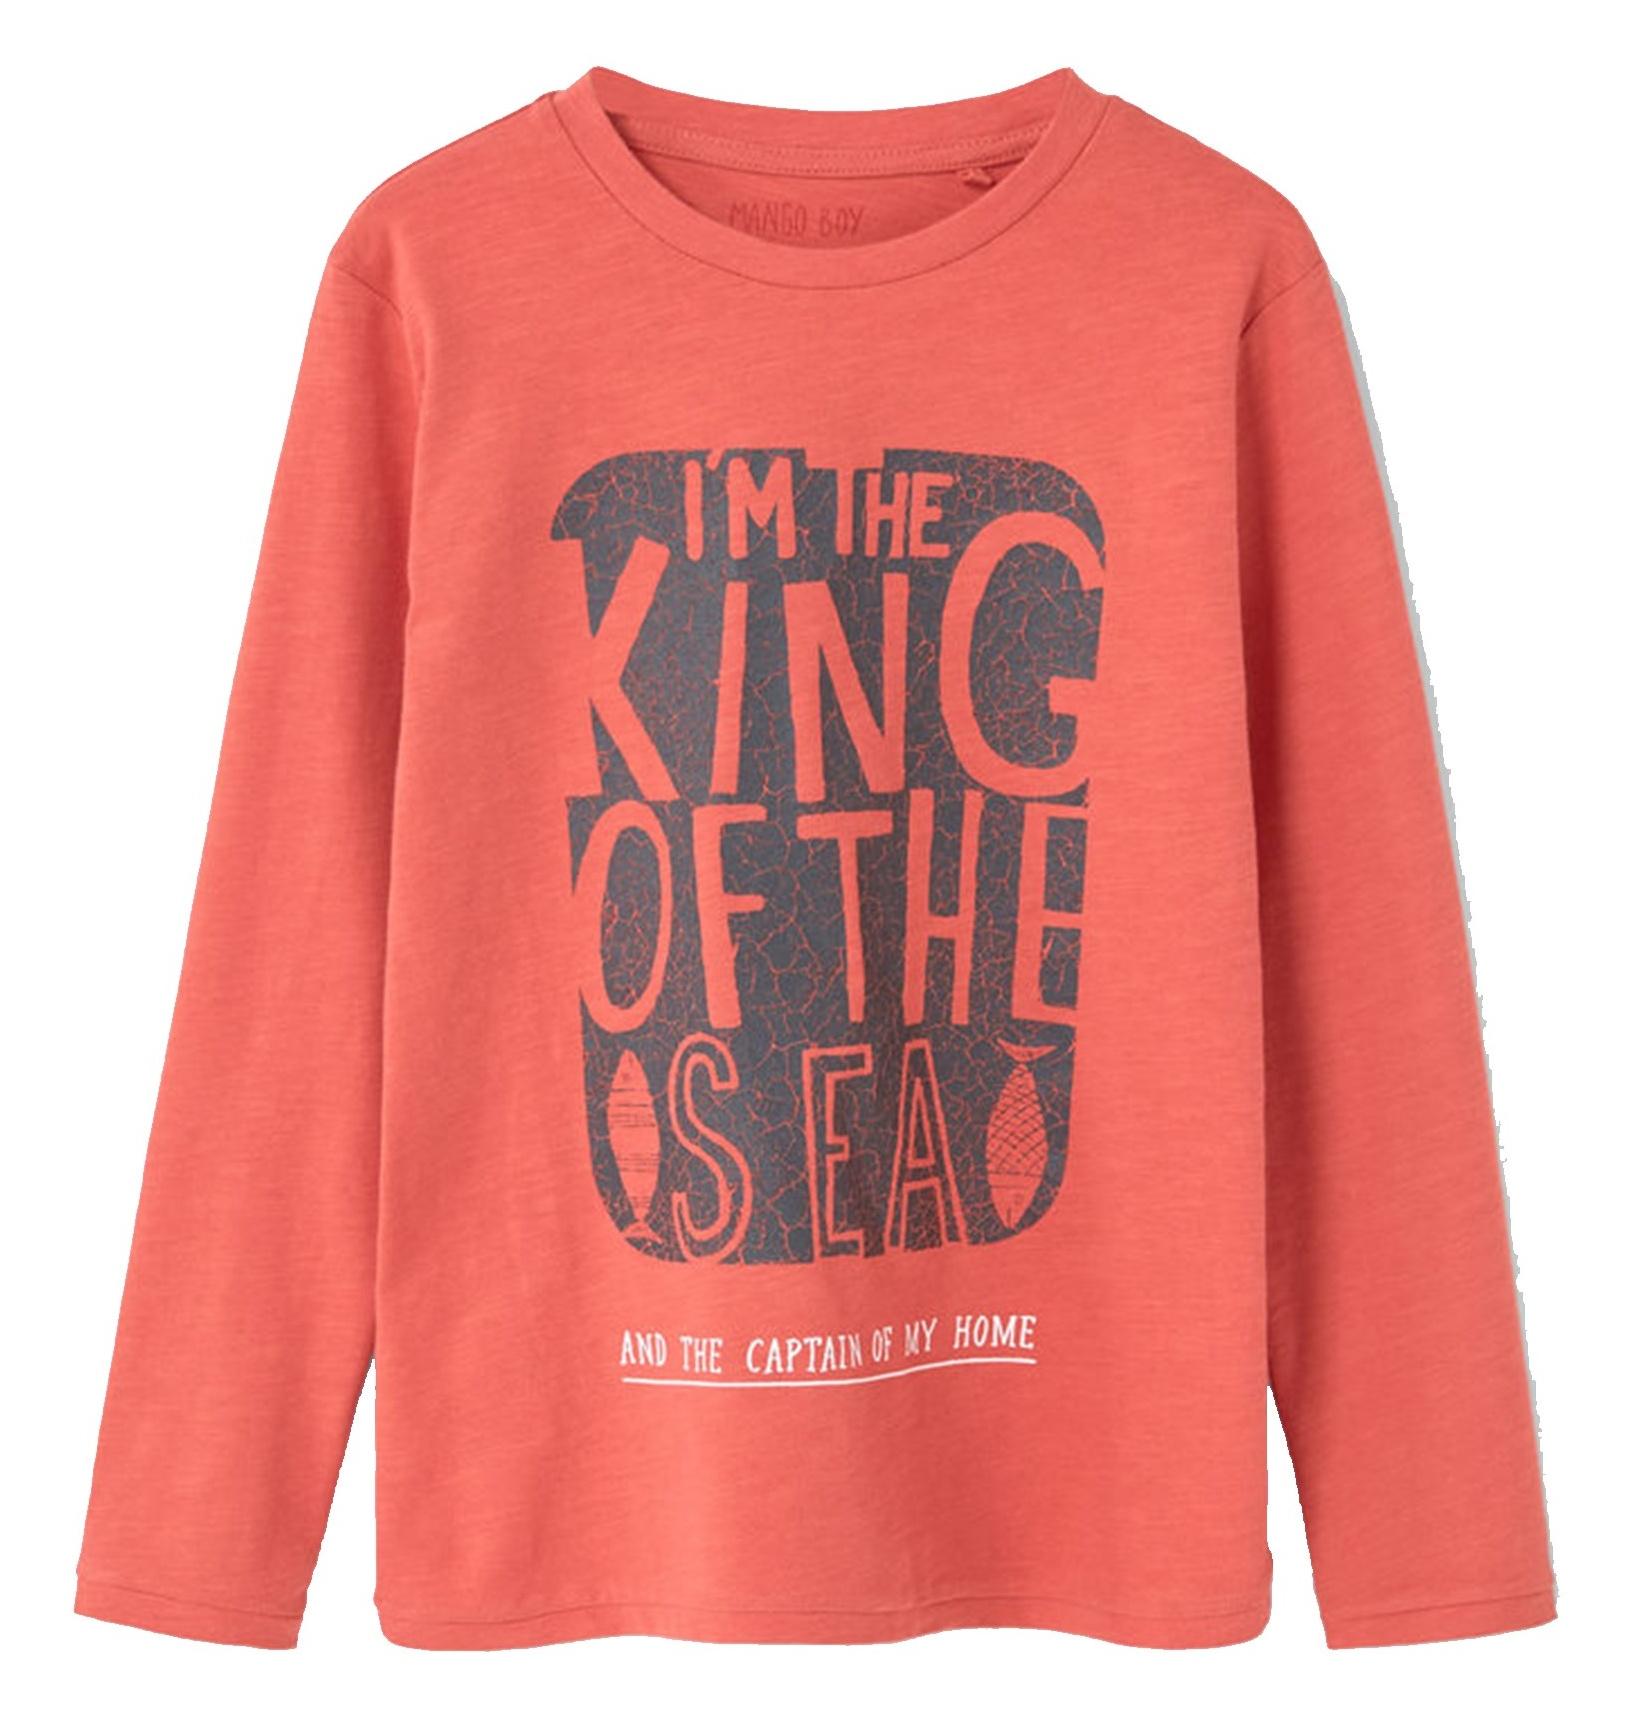 تی شرت نخی پسرانه - مانگو -  - 1